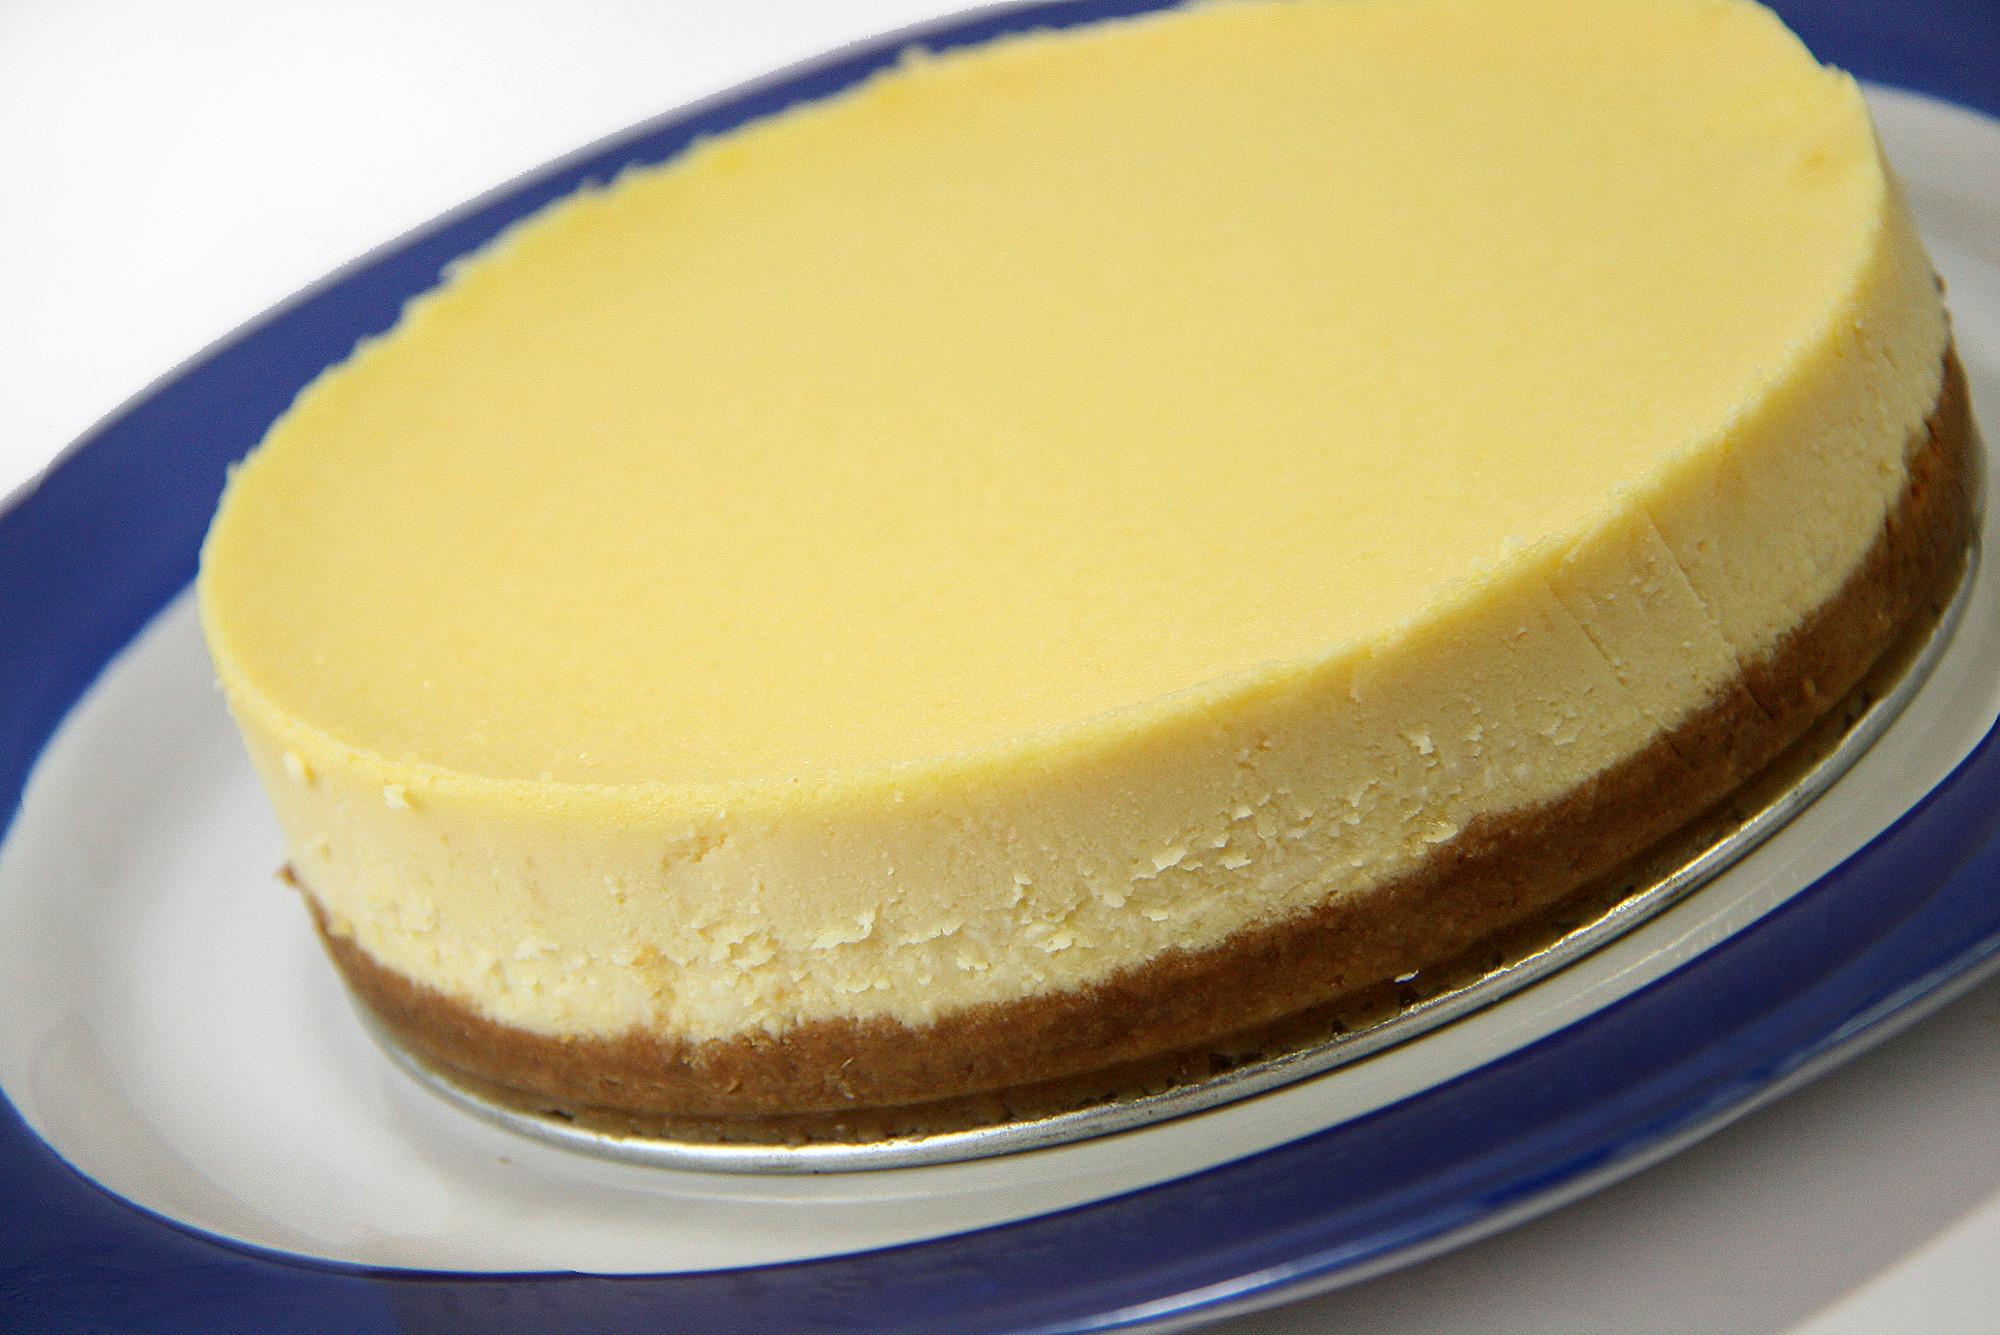 How To Make Cheese Cake  e Preparare una Cheesecake al Baileys 9 Passaggi